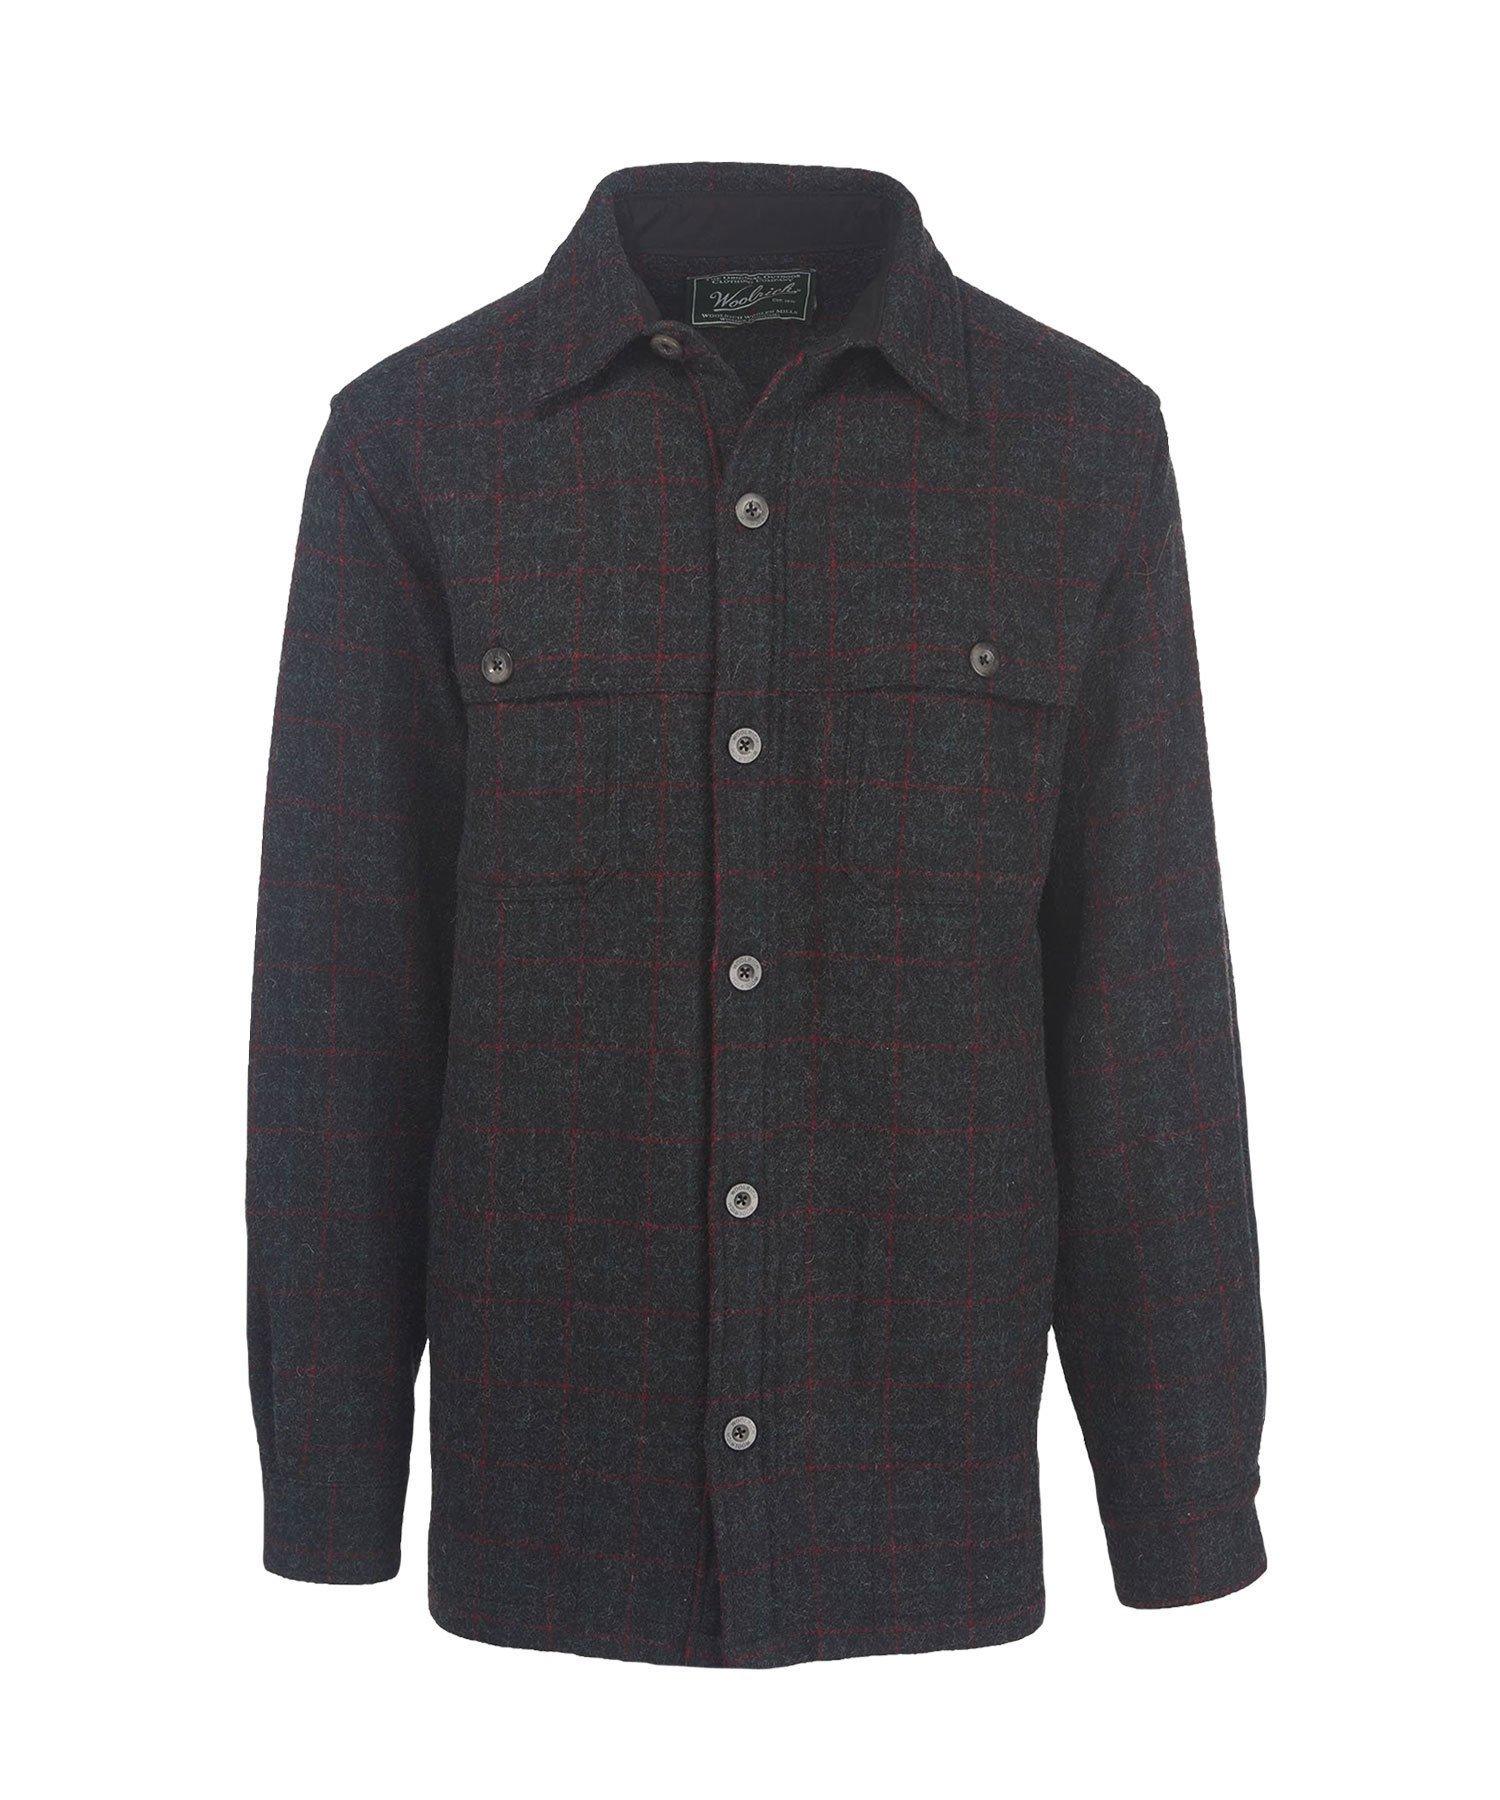 Woolrich Men's Wool Stag Shirt Jac, MALONE PLAID (CCL) (Black), Size XL